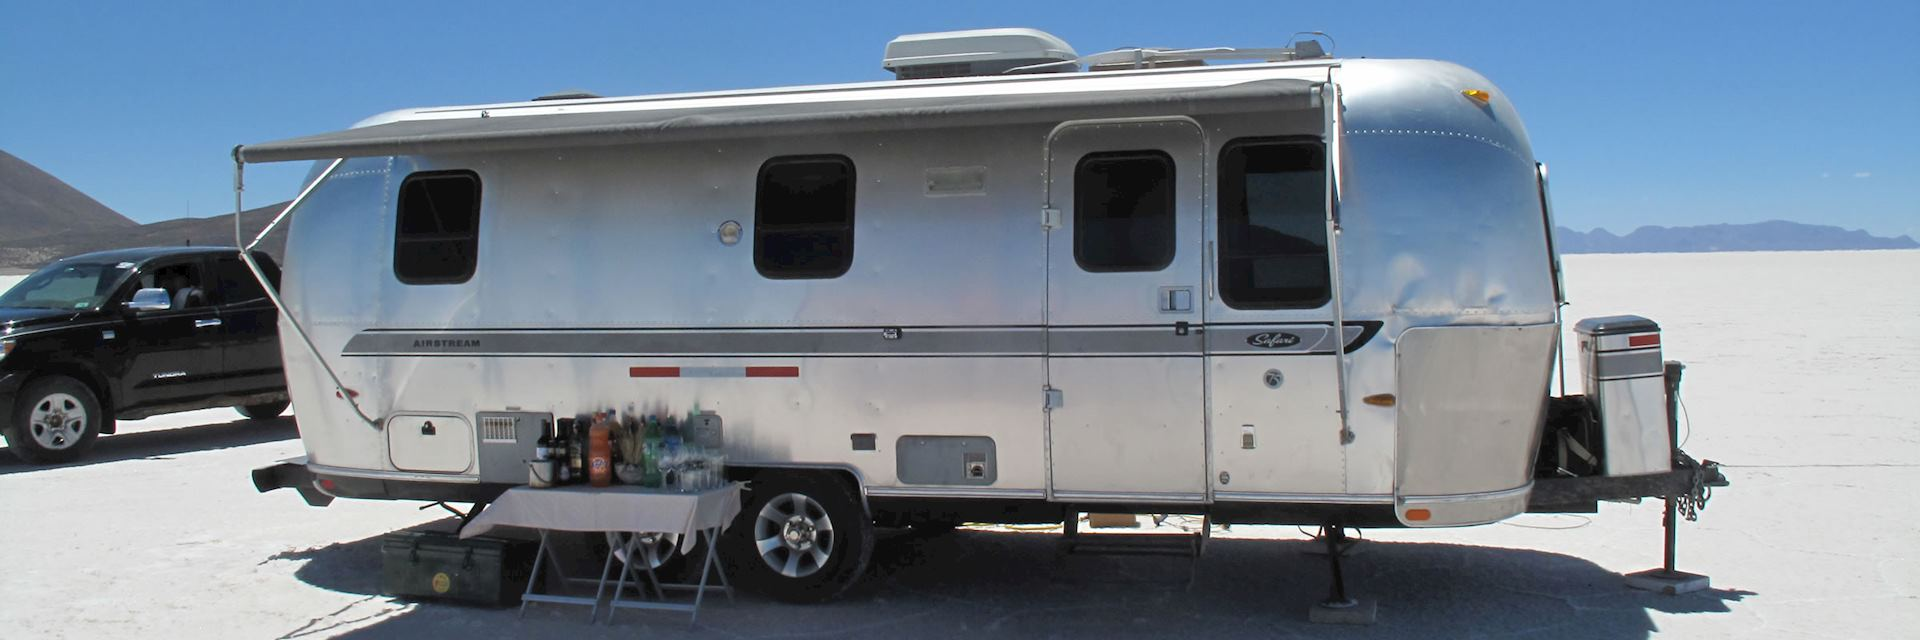 Deluxe Airstream camper, Salar de Uyuni